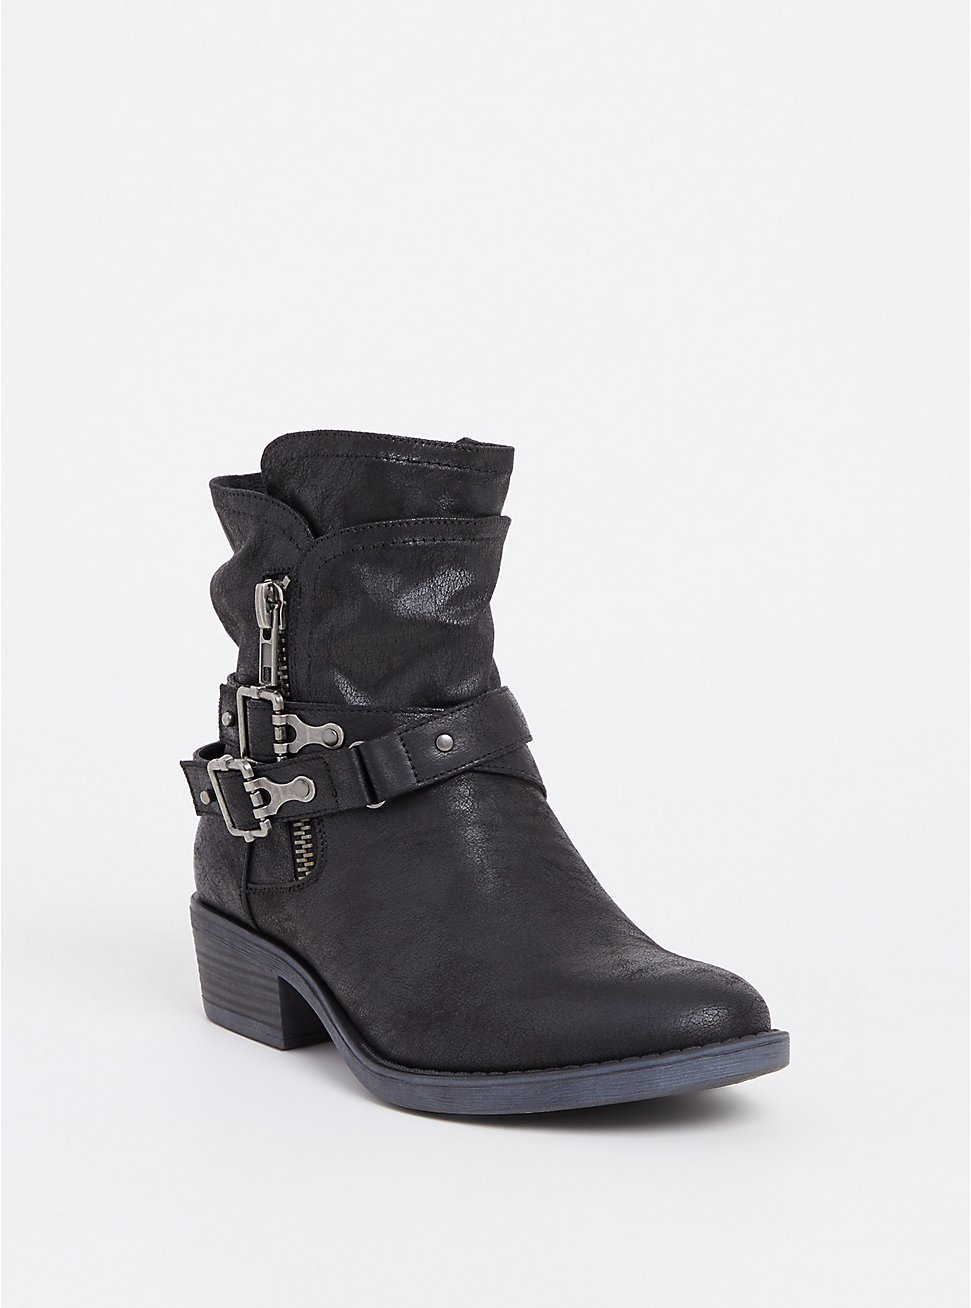 Plus Size Black Brushed Faux Leather Moto Bootie (WW), BLACK, hi-res